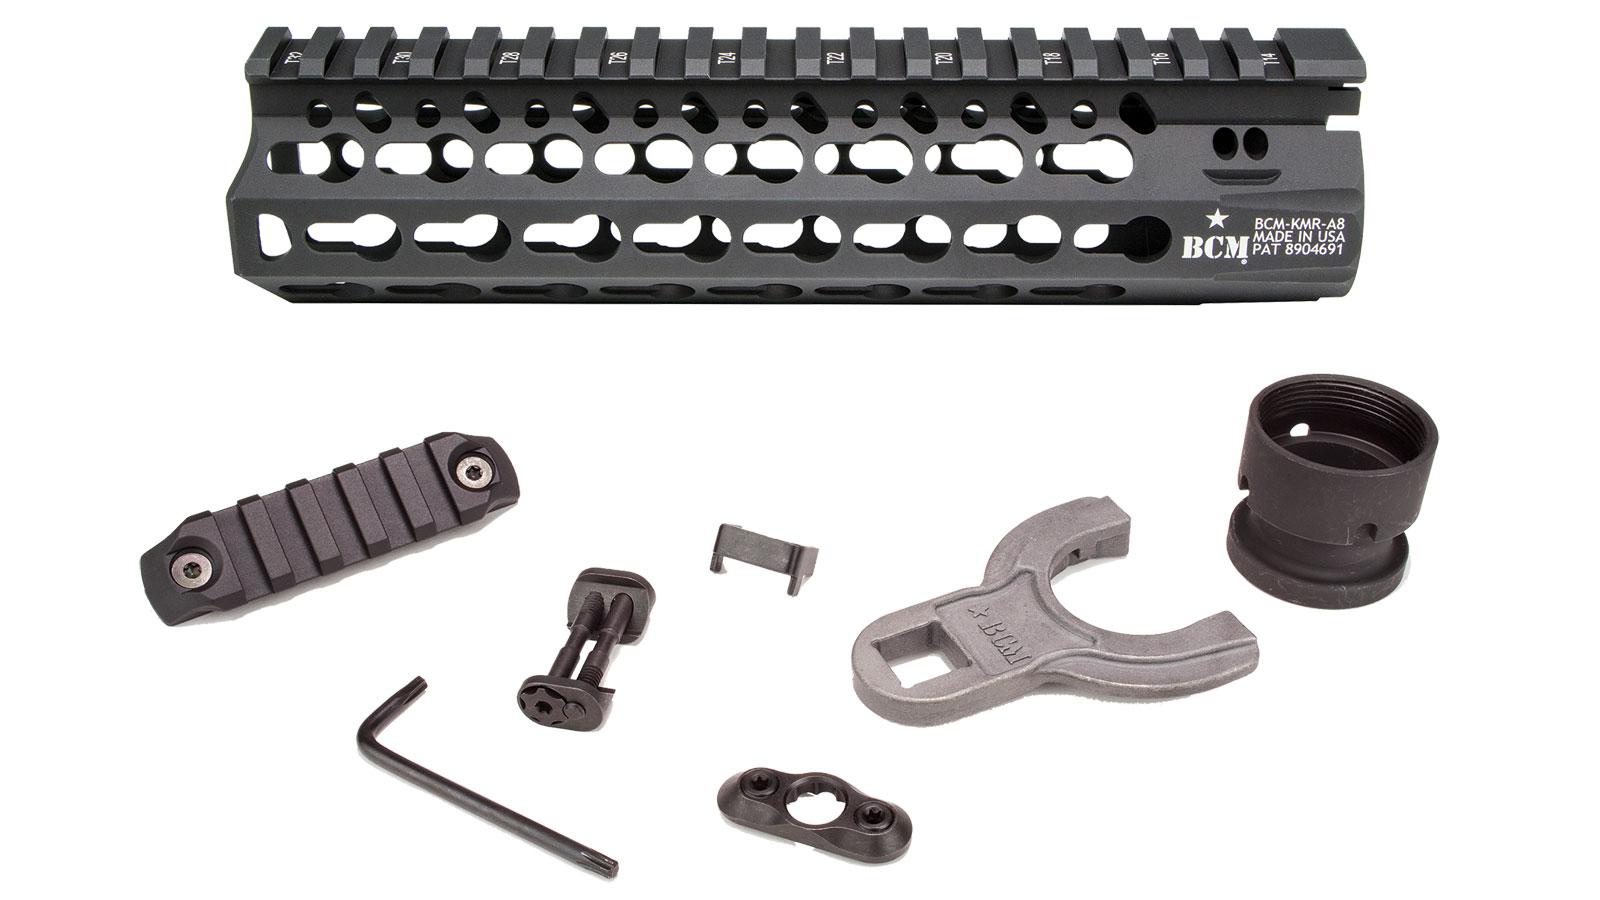 Bravo Company KMR-Alpha Rail Keymod Black 8 Inch